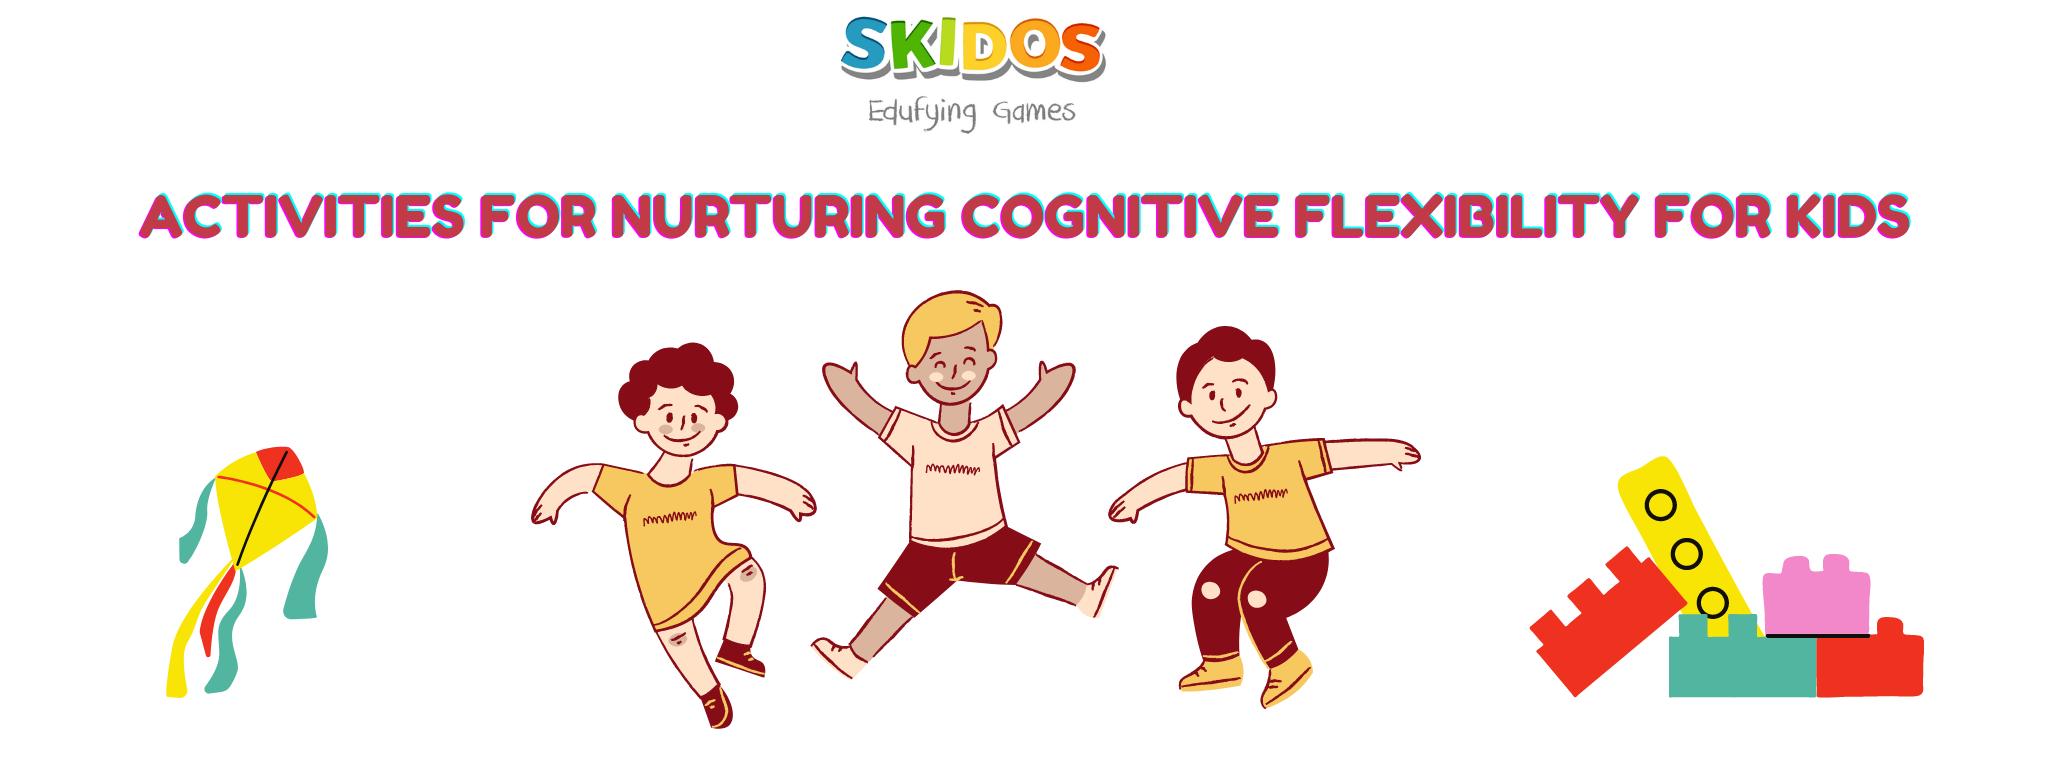 Cognitive flexibility Activities for kids